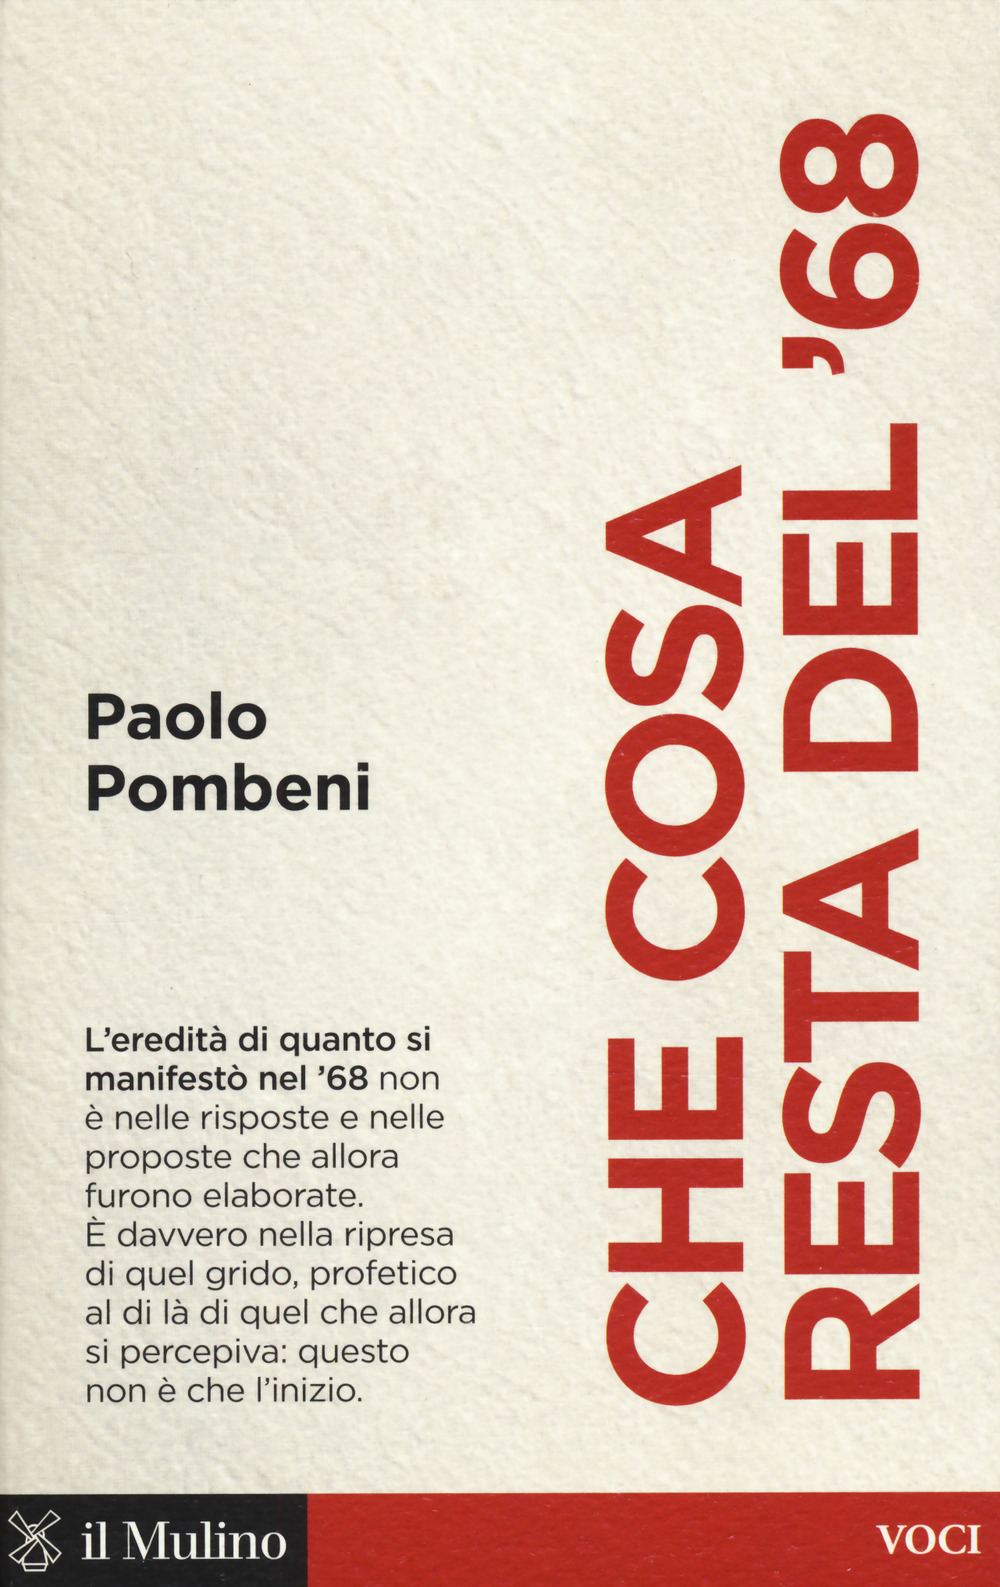 Paolo Pombeni